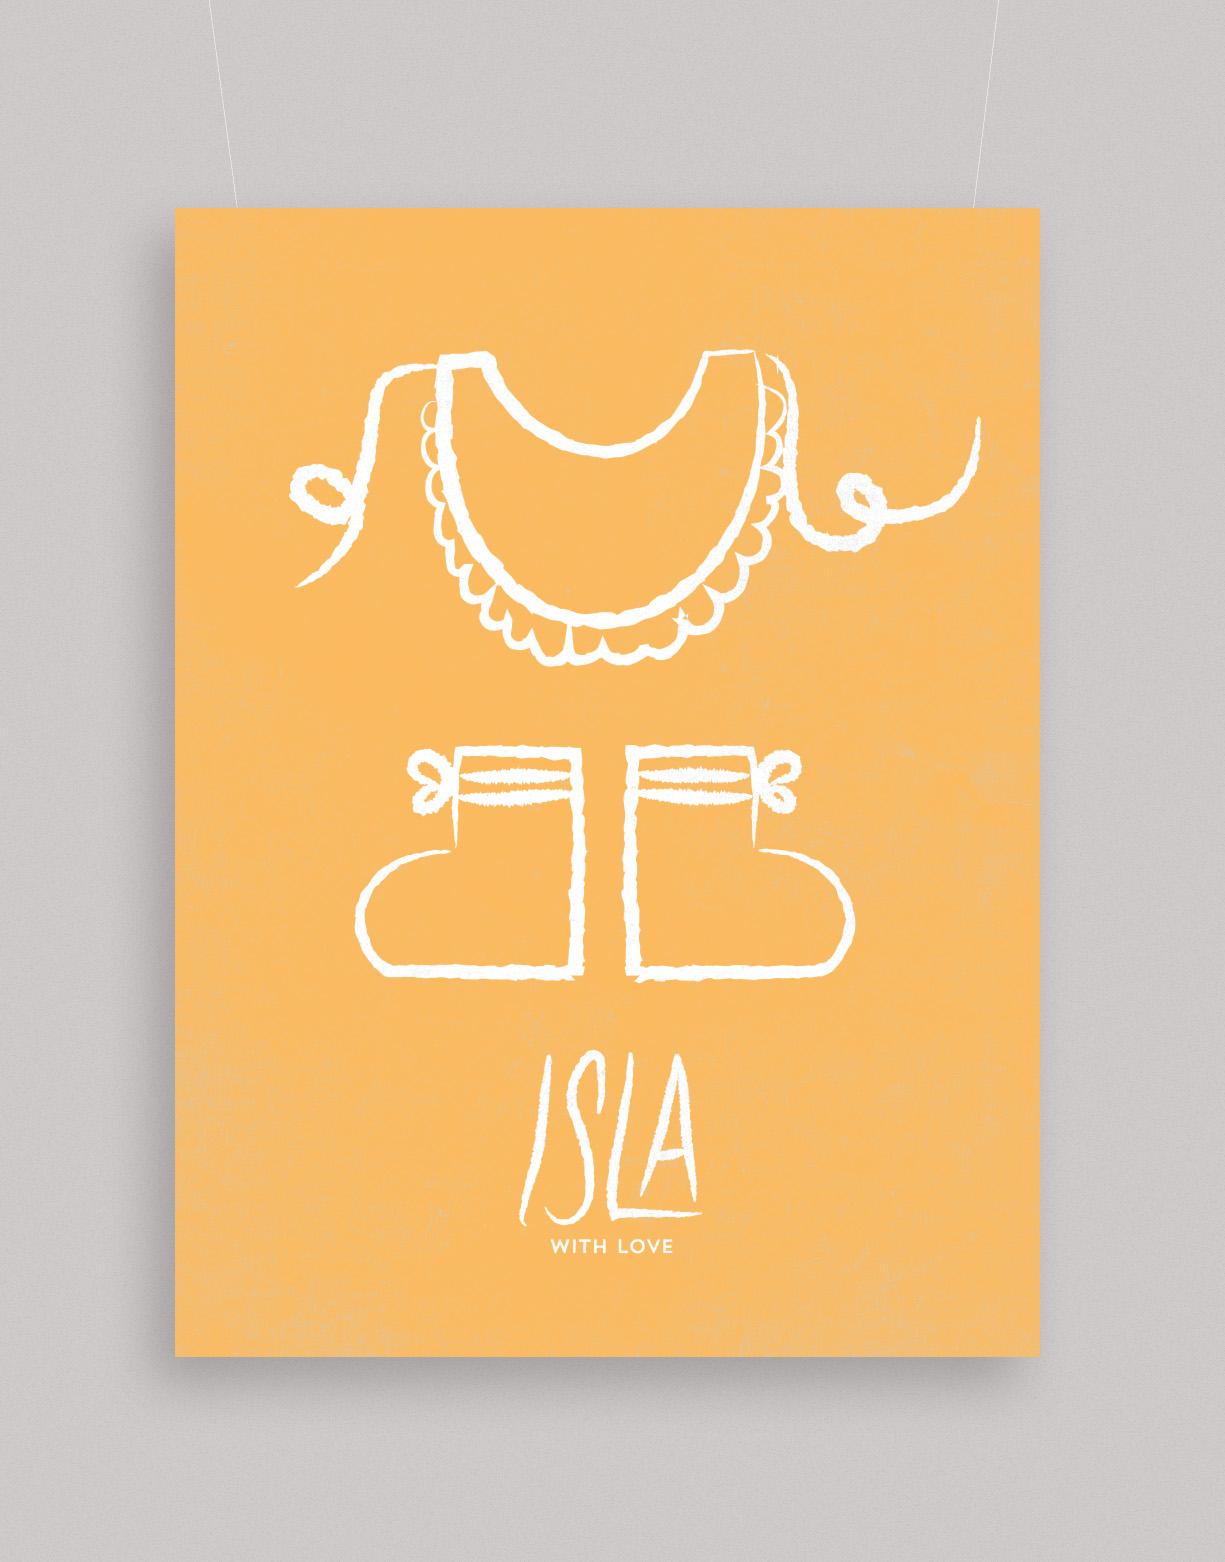 Posters_Isla 06.jpg